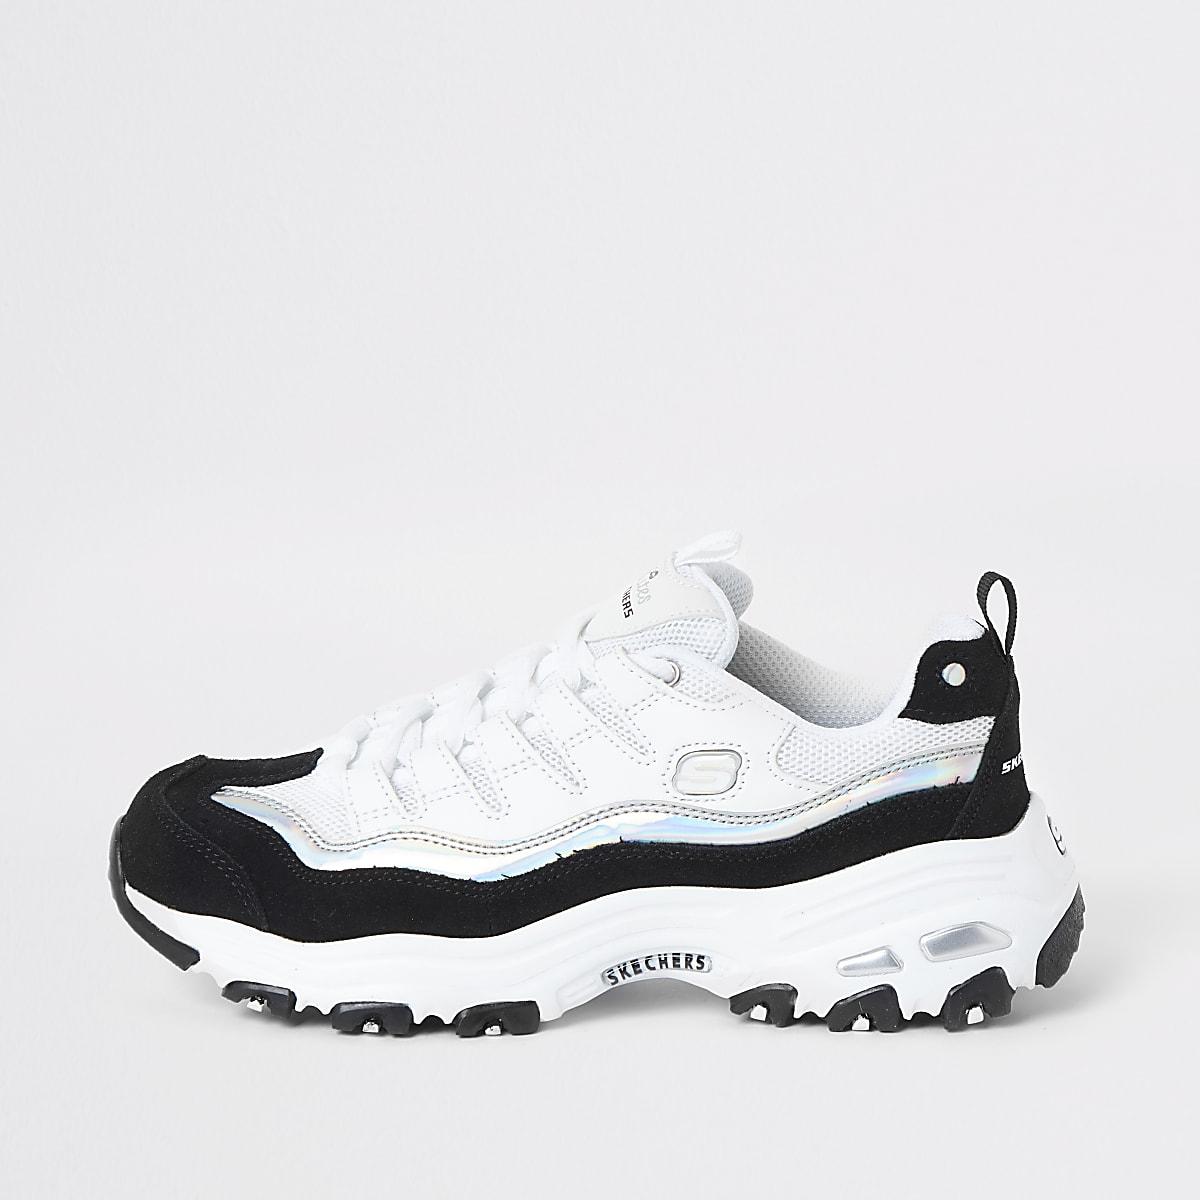 Skechers Grand View - Witte sneakers